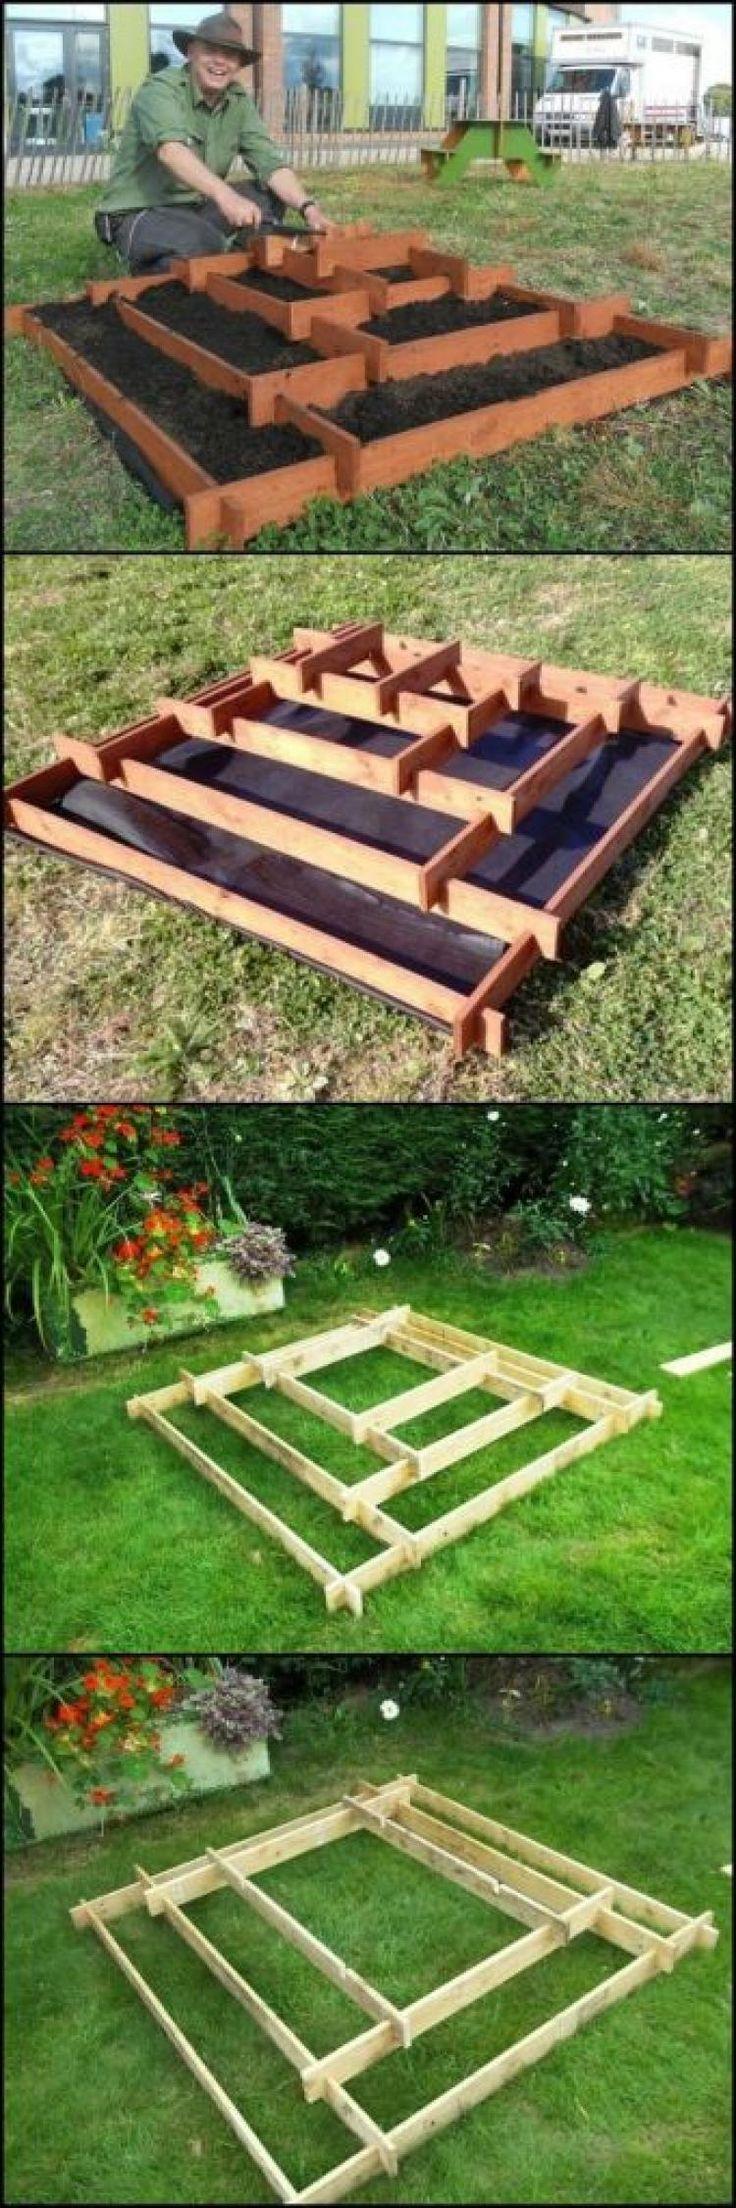 Unusual Creative Wood Pallet Garden Project Ideas